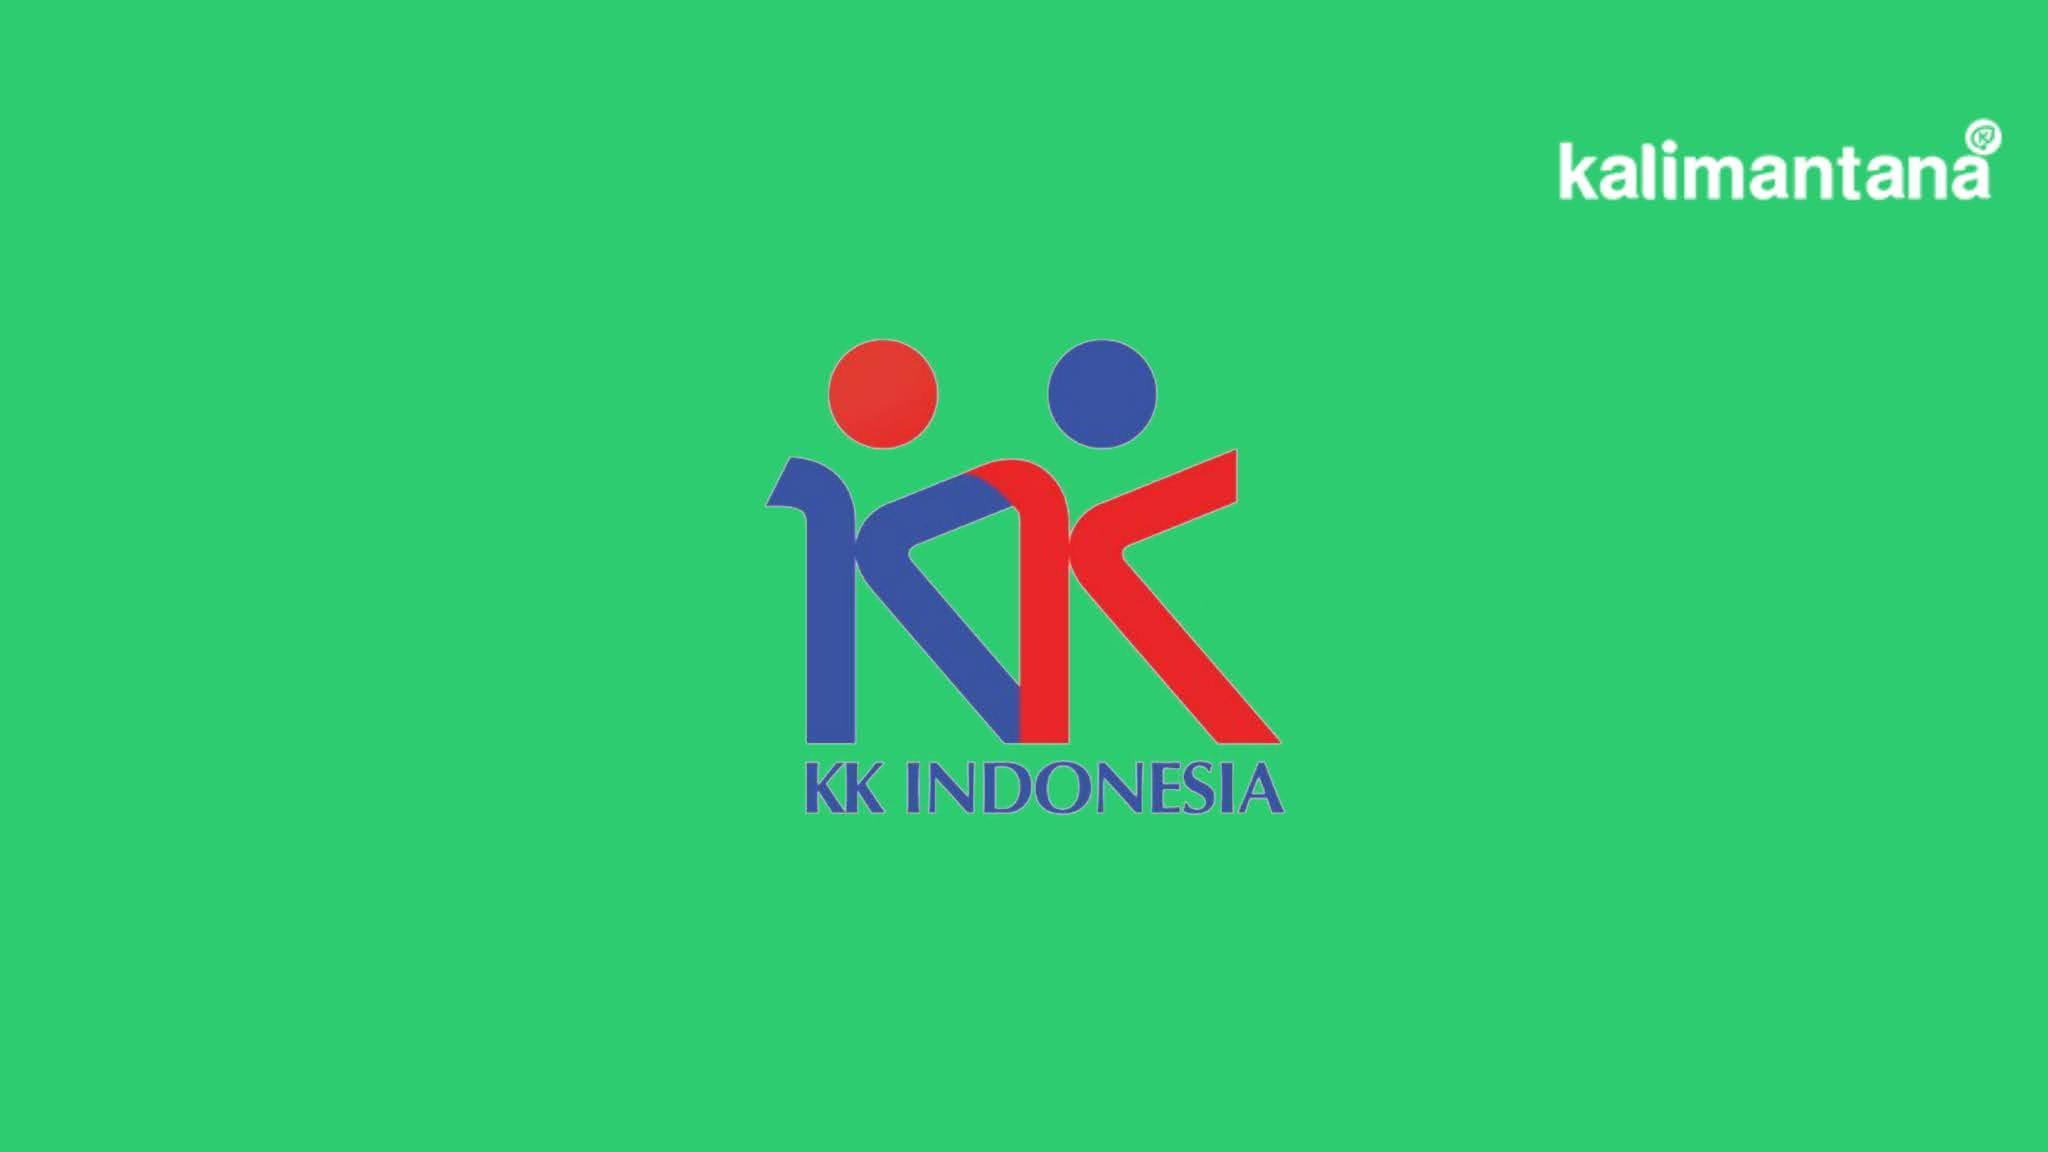 KK Indonesia